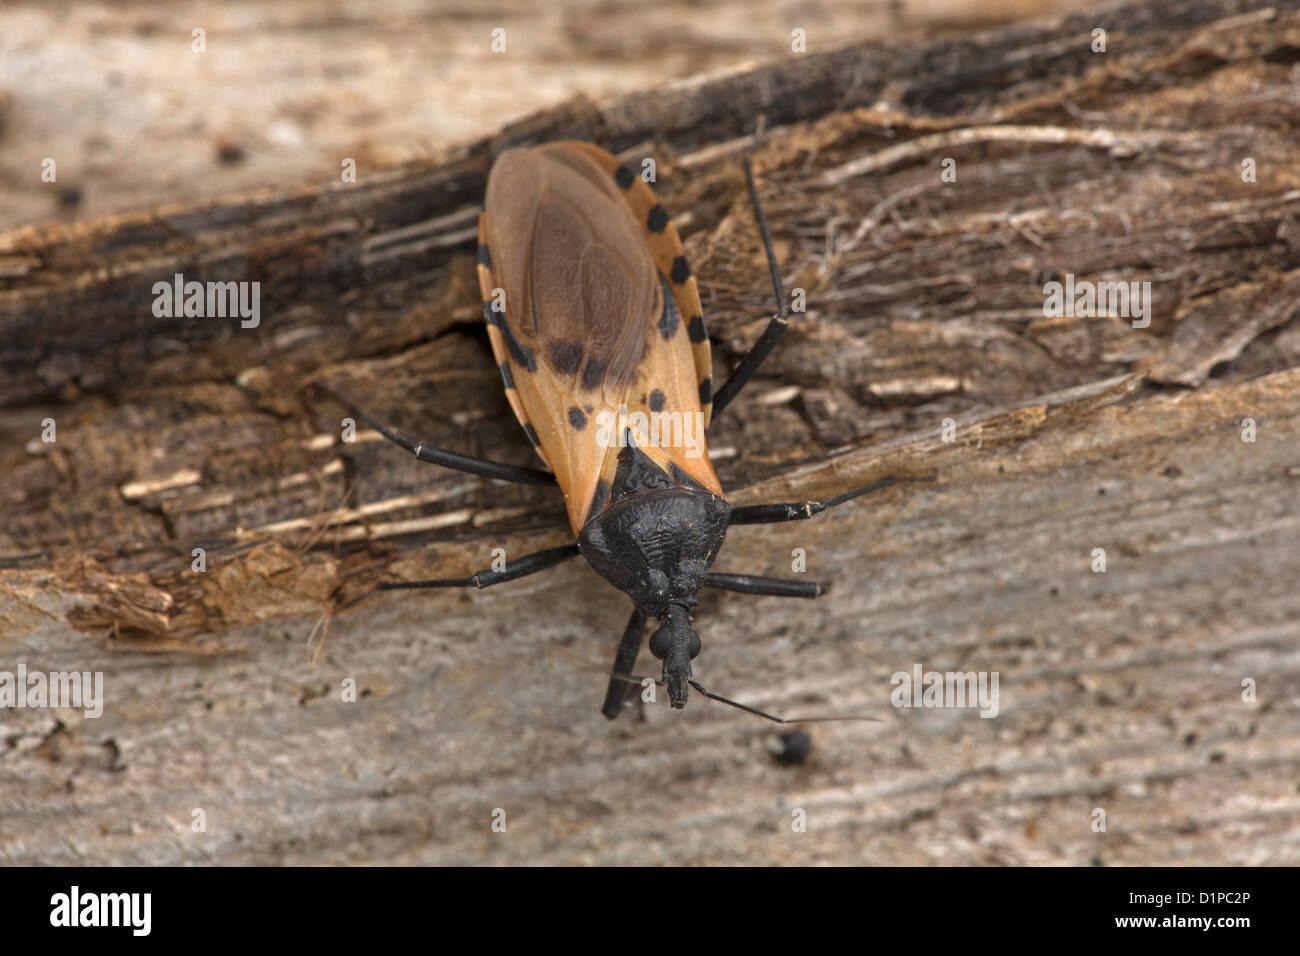 Kissing bug Triatoma dimidiata,le principal vecteur de Trypanosoma cruzi au Costa Rica, transmet la maladie de Chagas,famille Photo Stock